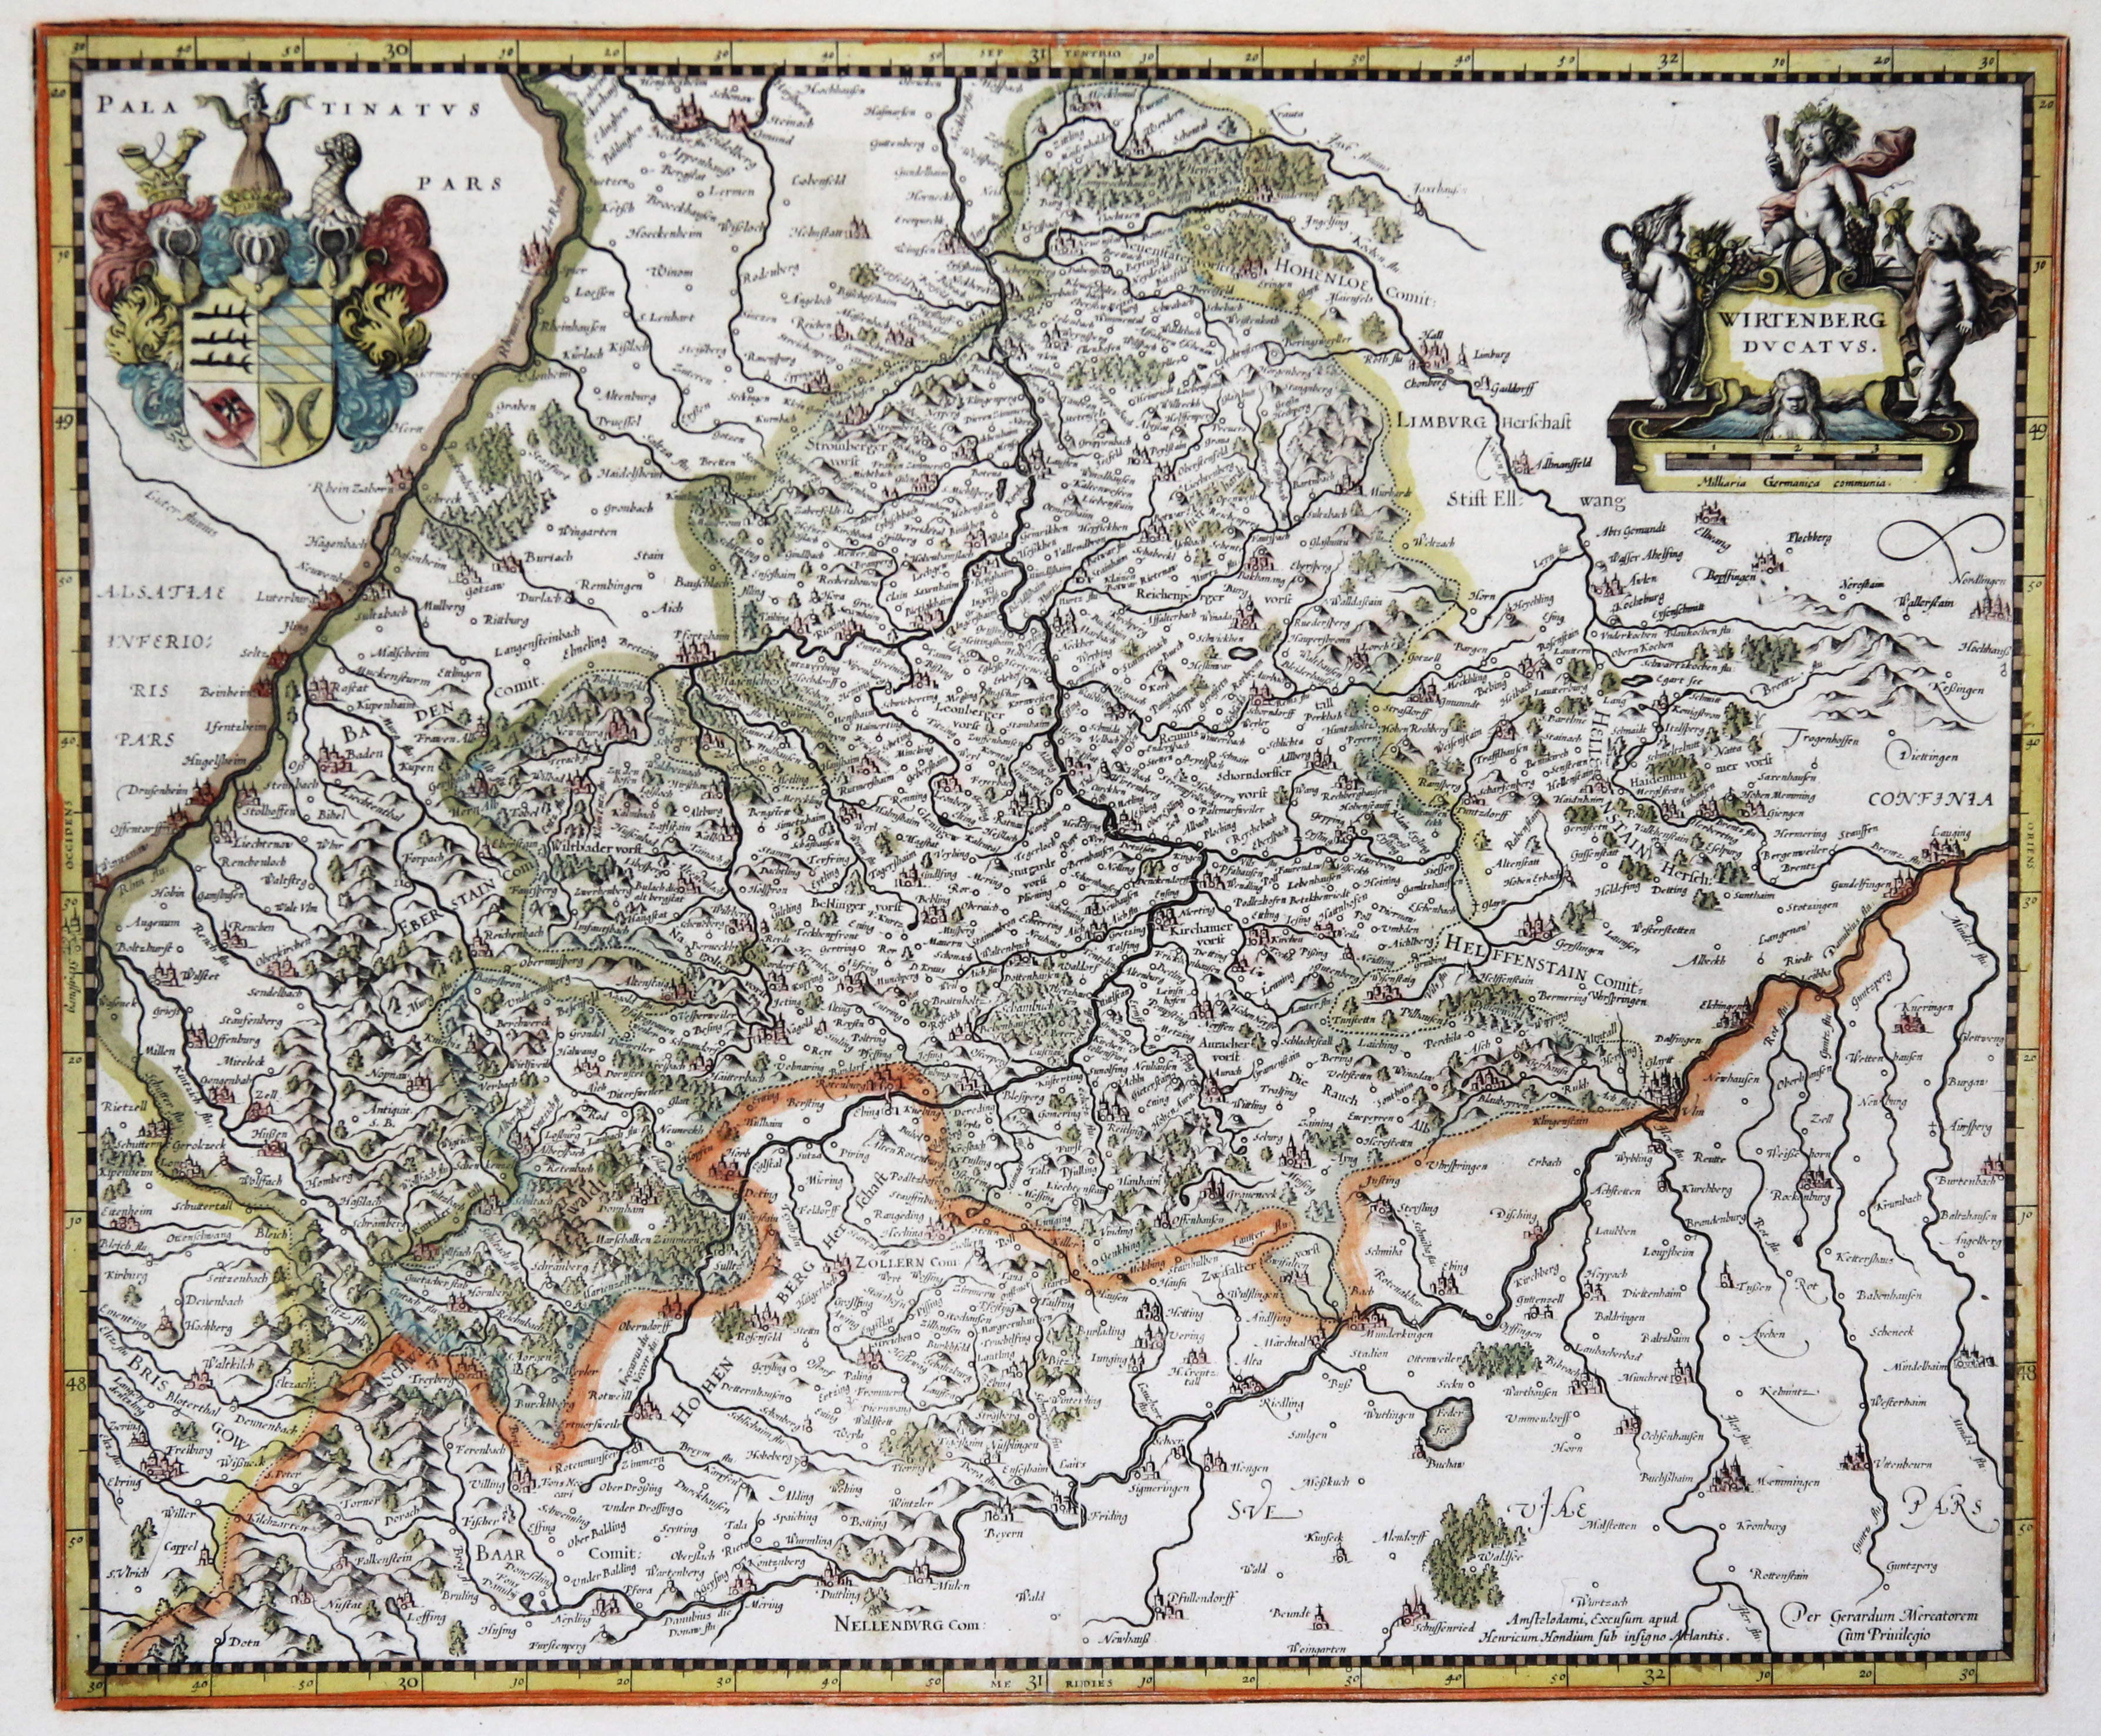 Kst.- Karte, n. Mercator und H. Hondius: Württemberg ( Herzogtum